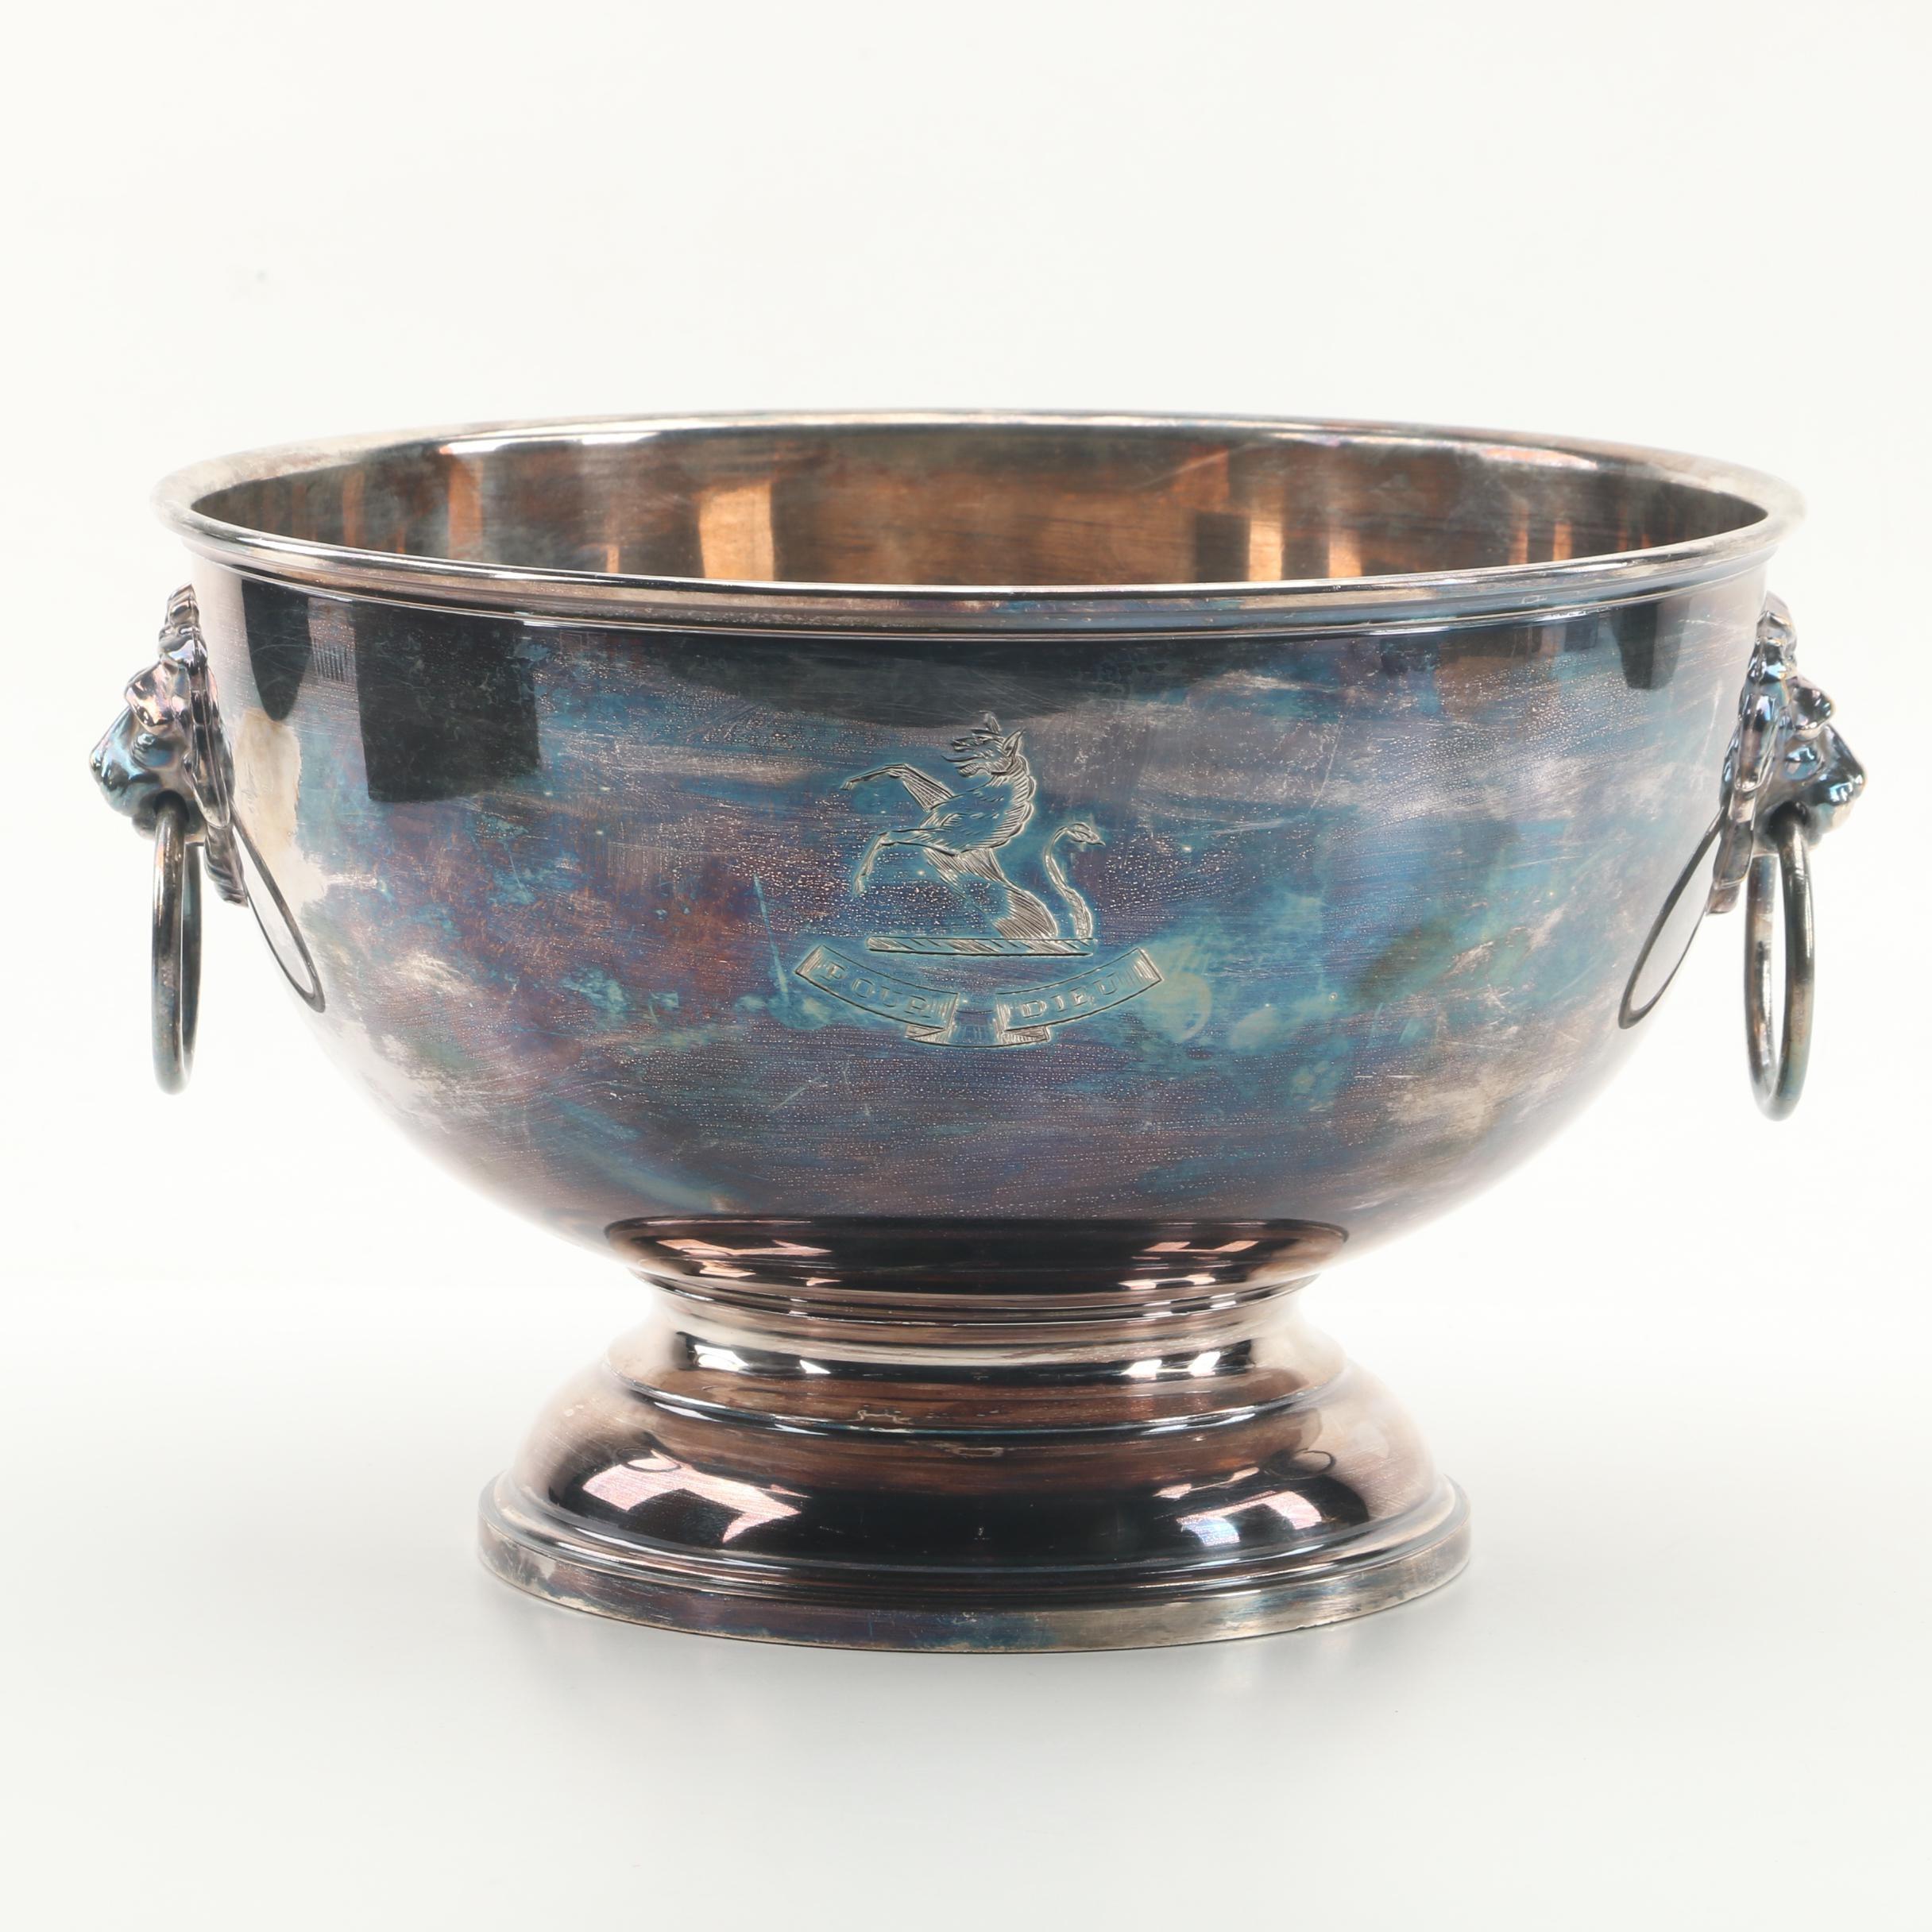 Vintage English Silver Plate Pedestal Bowl with Lion's Head Drop Handles